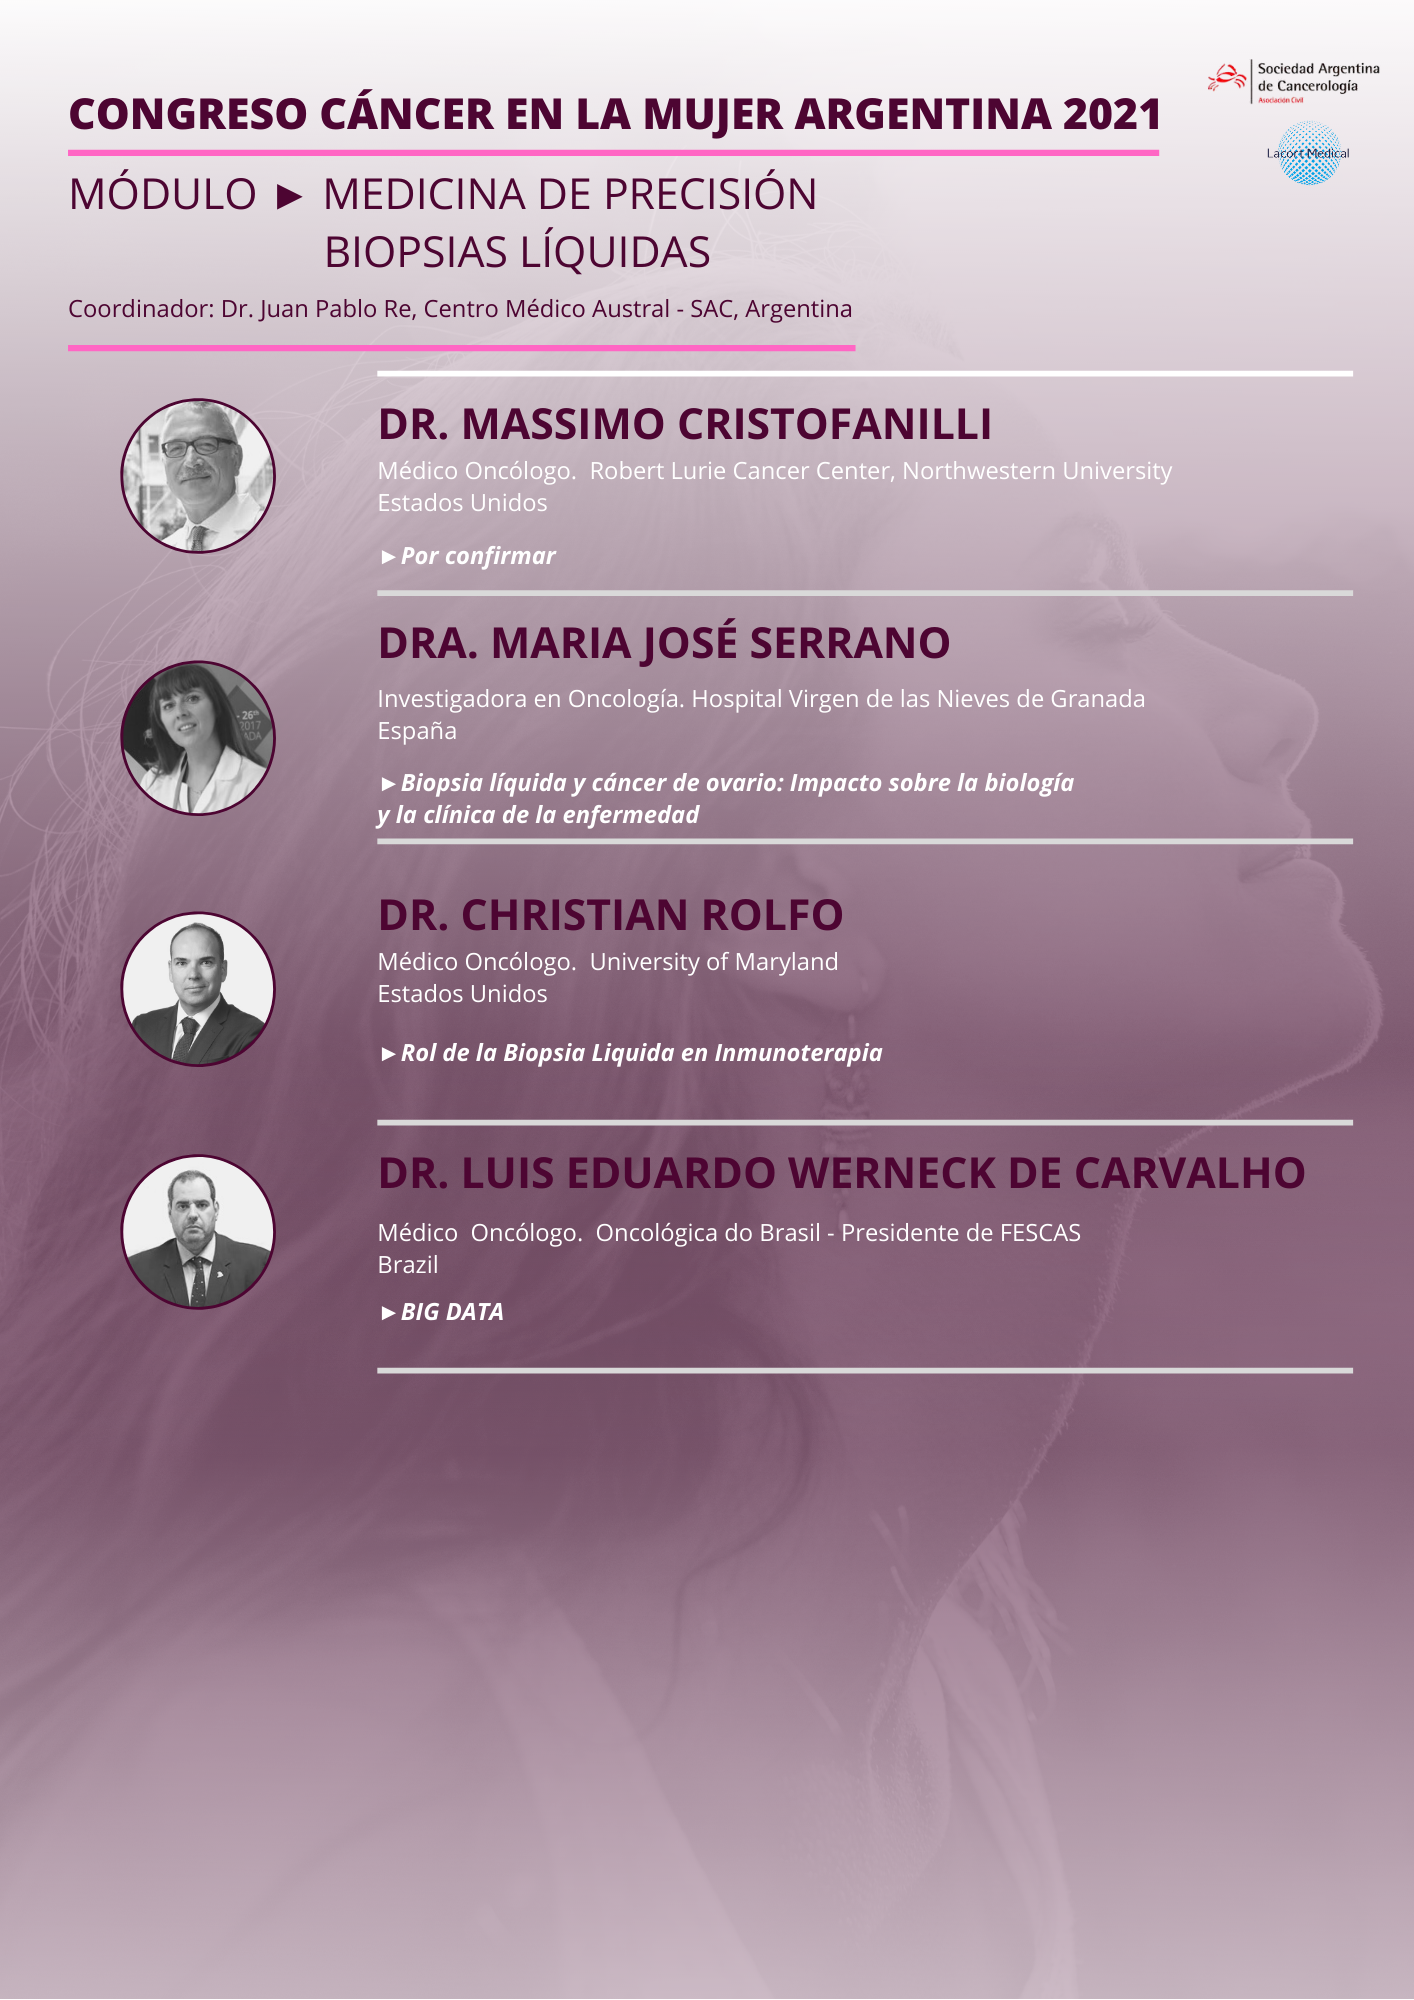 AGENDA ACADEMICA ARGENTINA 2021 (6).png